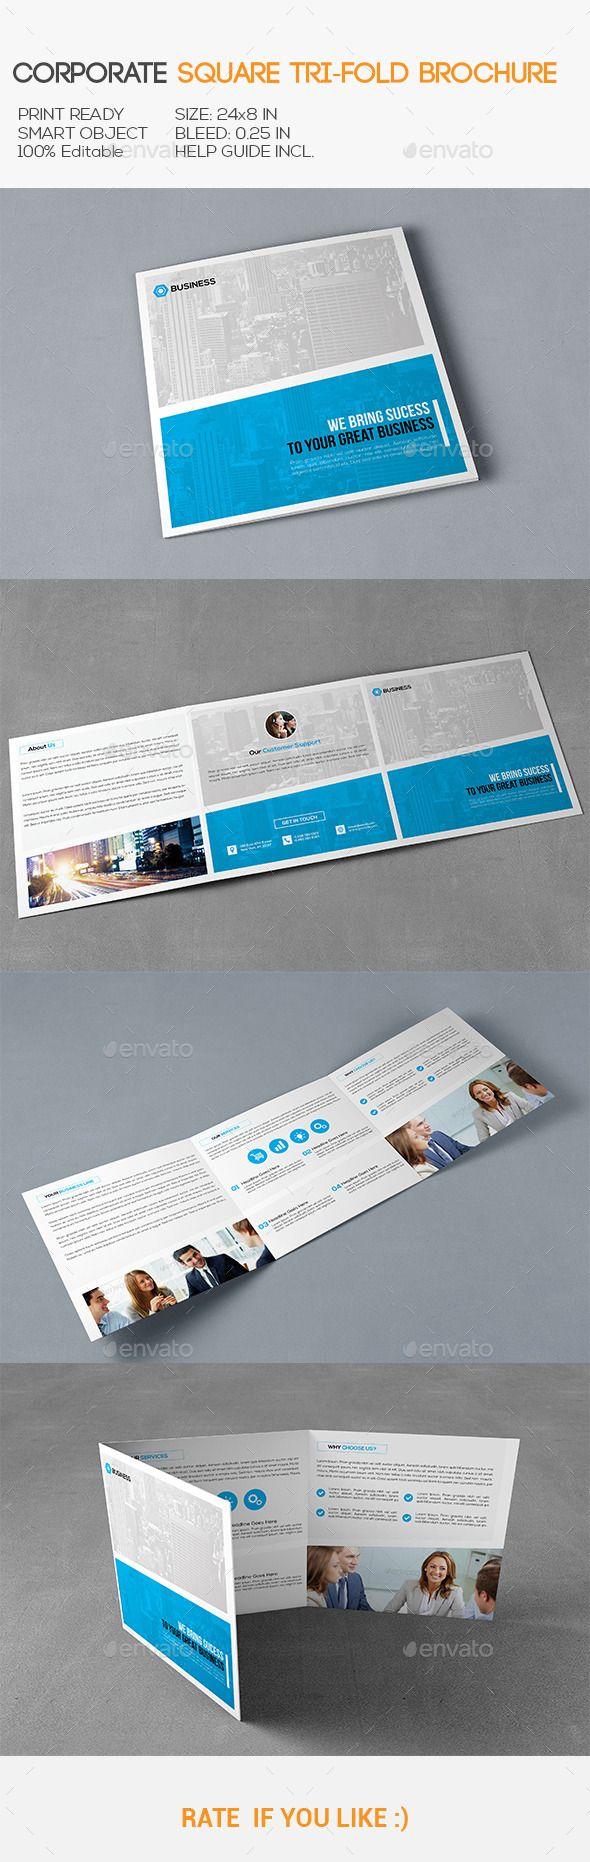 Square Corporate Trifold Brochure Design Template. Download: http://graphicriver.net/item/square-corporate-trifold-brochure/11357382?ref=ksioks